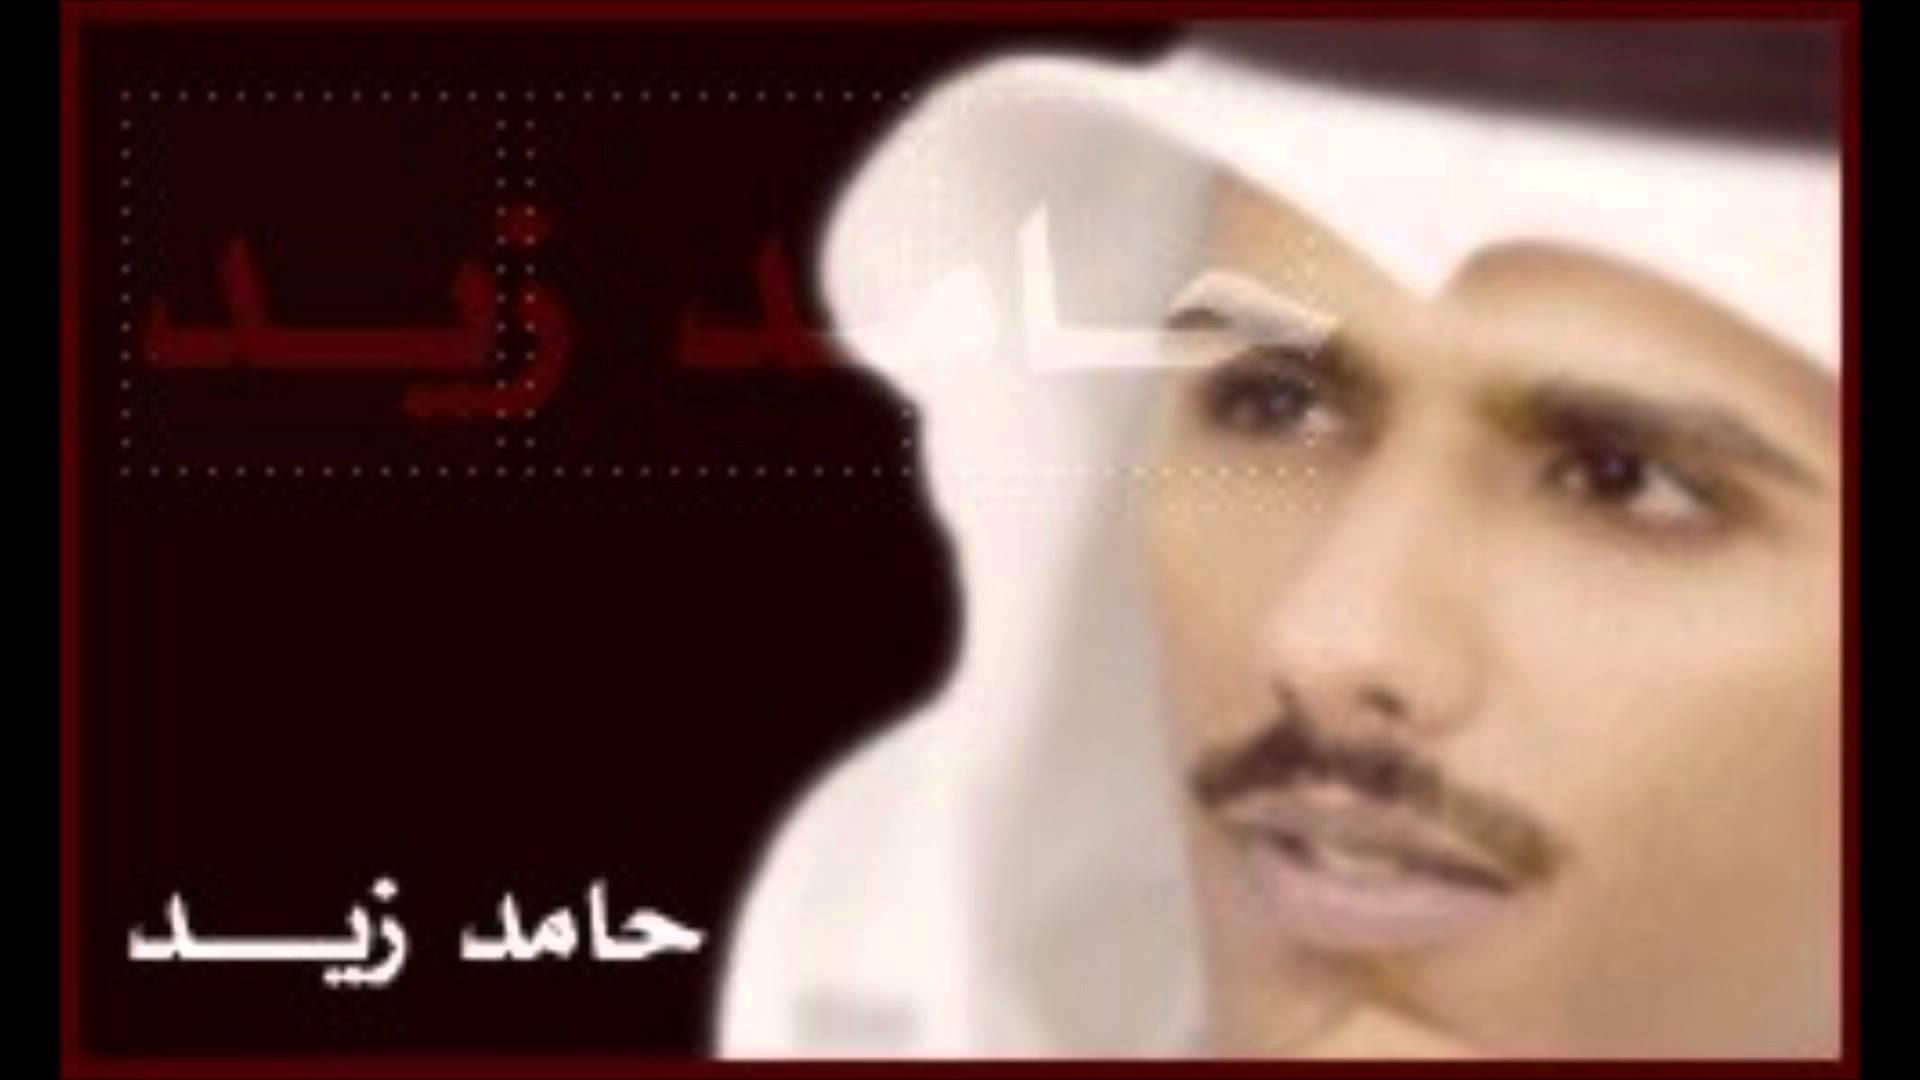 بالصور قصائد حامد زيد , من اجمل ما غنى حامد زيد من قصائده 81 1